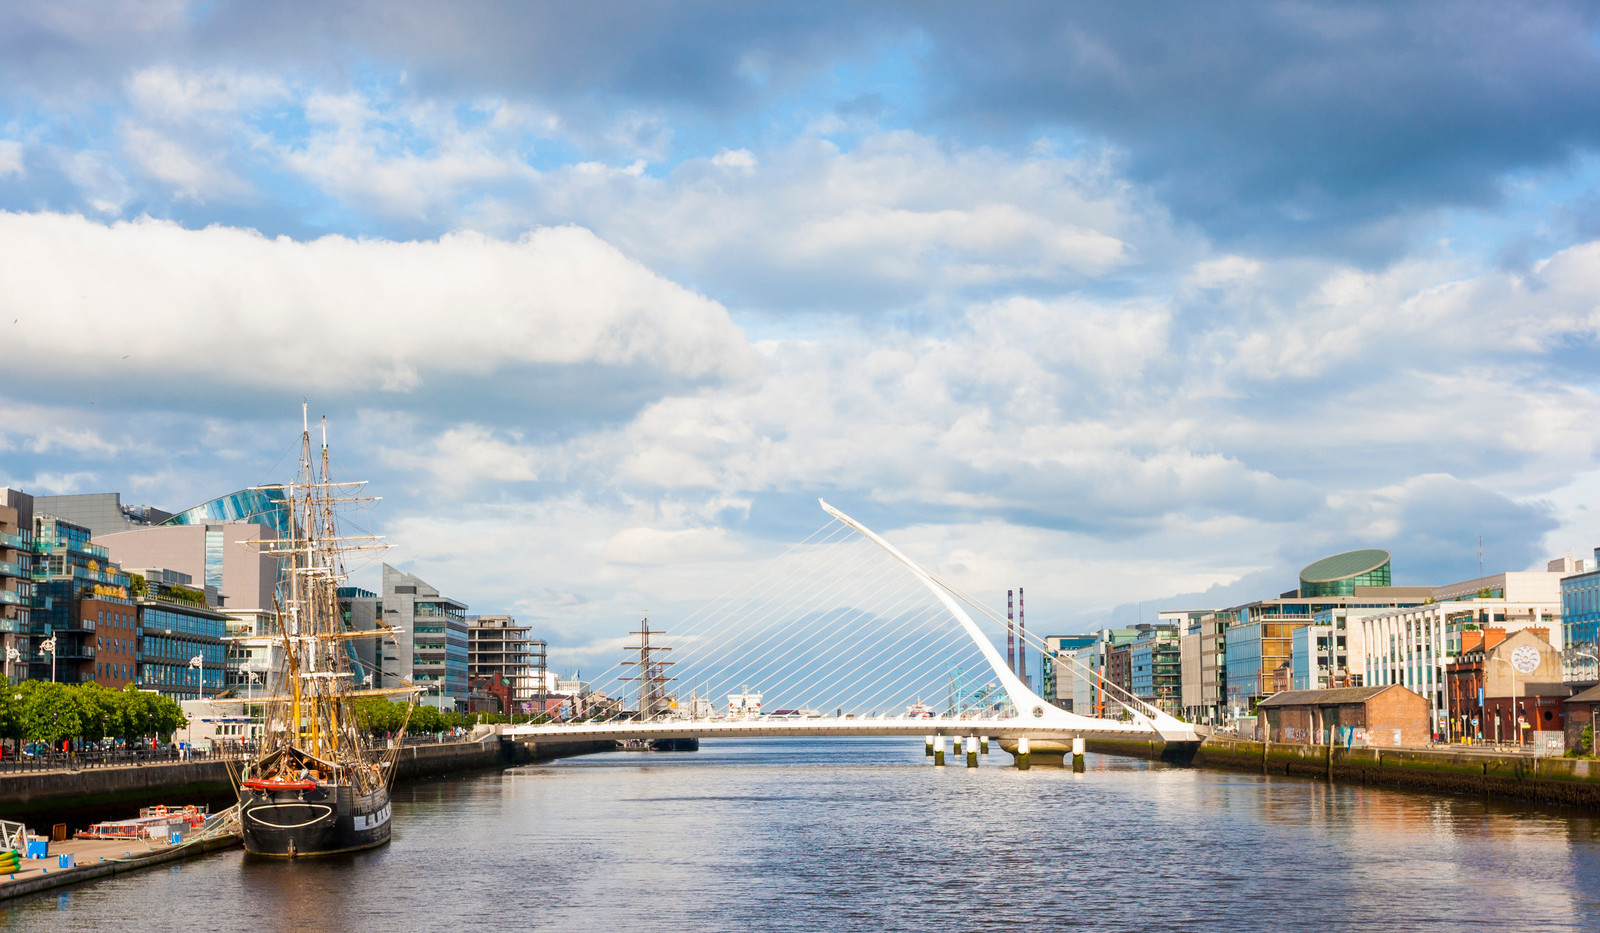 Canva - Liffey River in Dublin.jpg